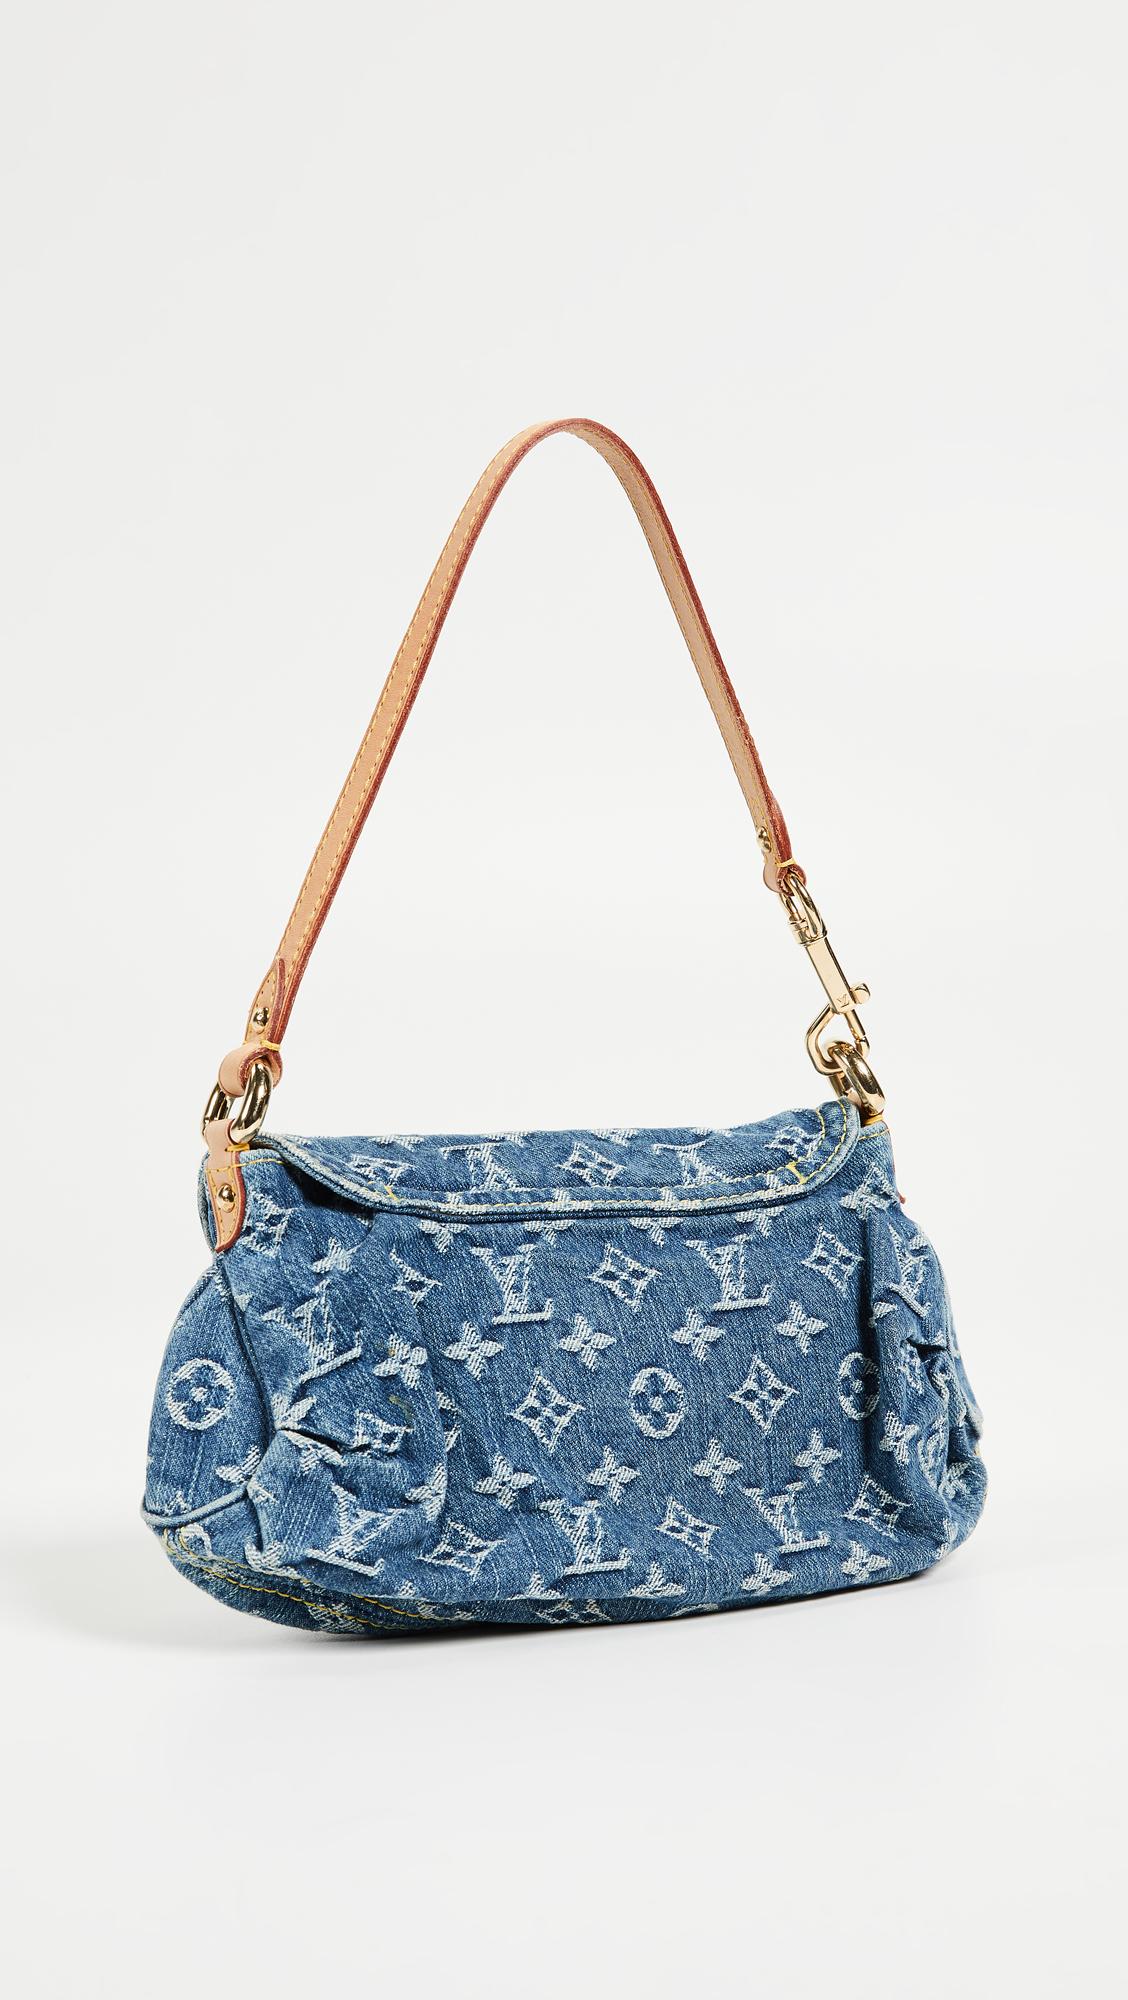 d0ea423d147022 What Goes Around Comes Around. Louis Vuitton Denim Pleaty Mini ...